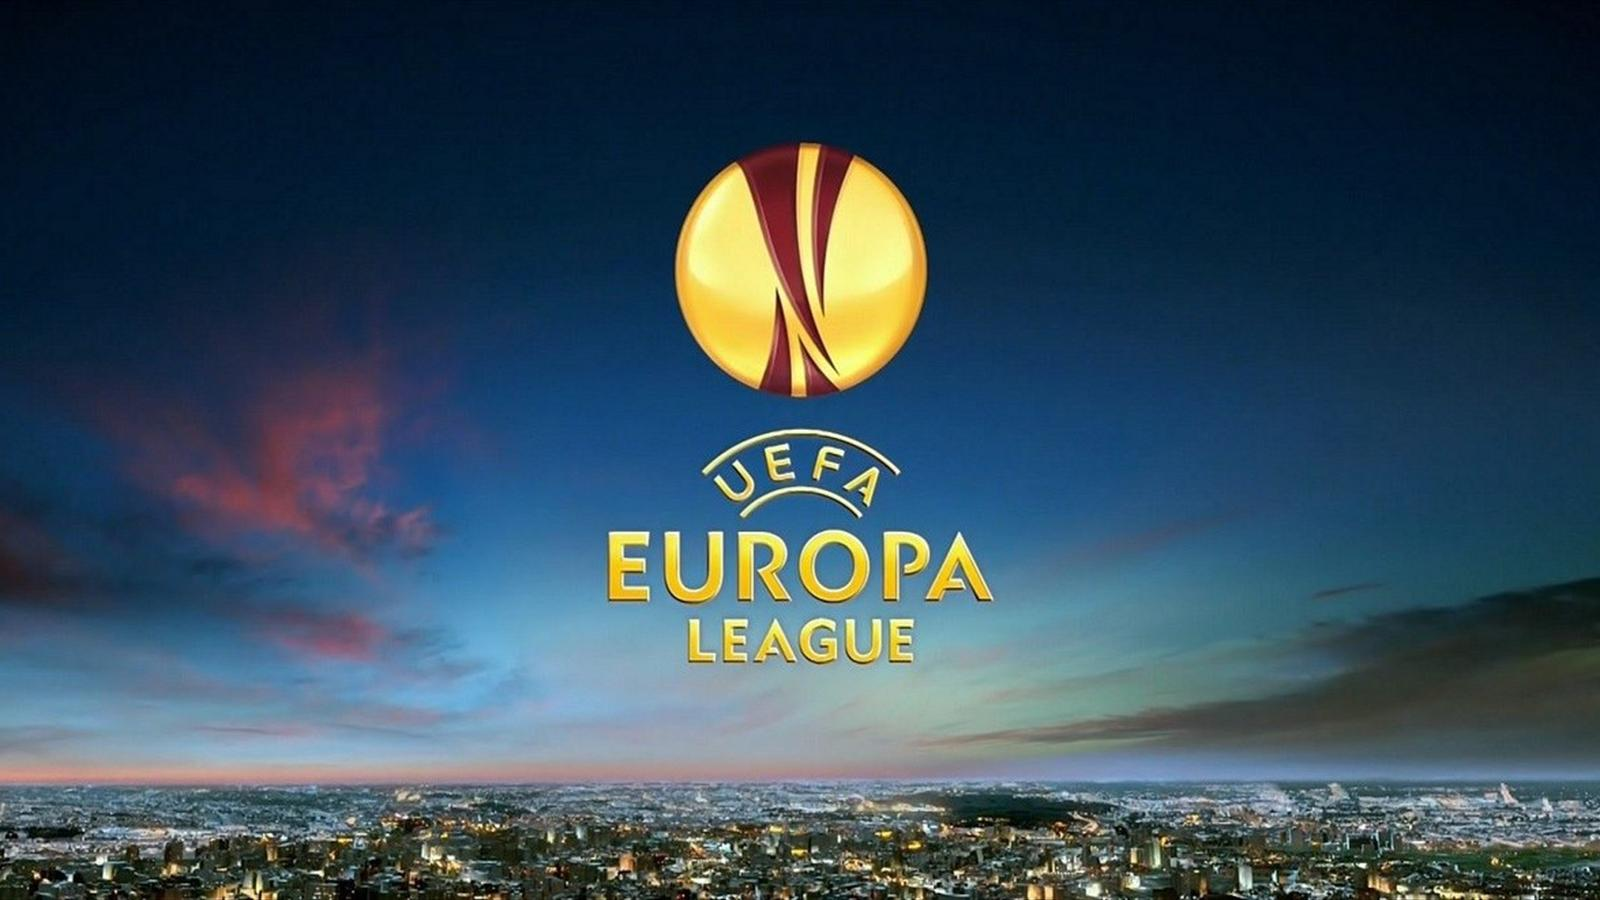 Прогноз по футболу лига европы